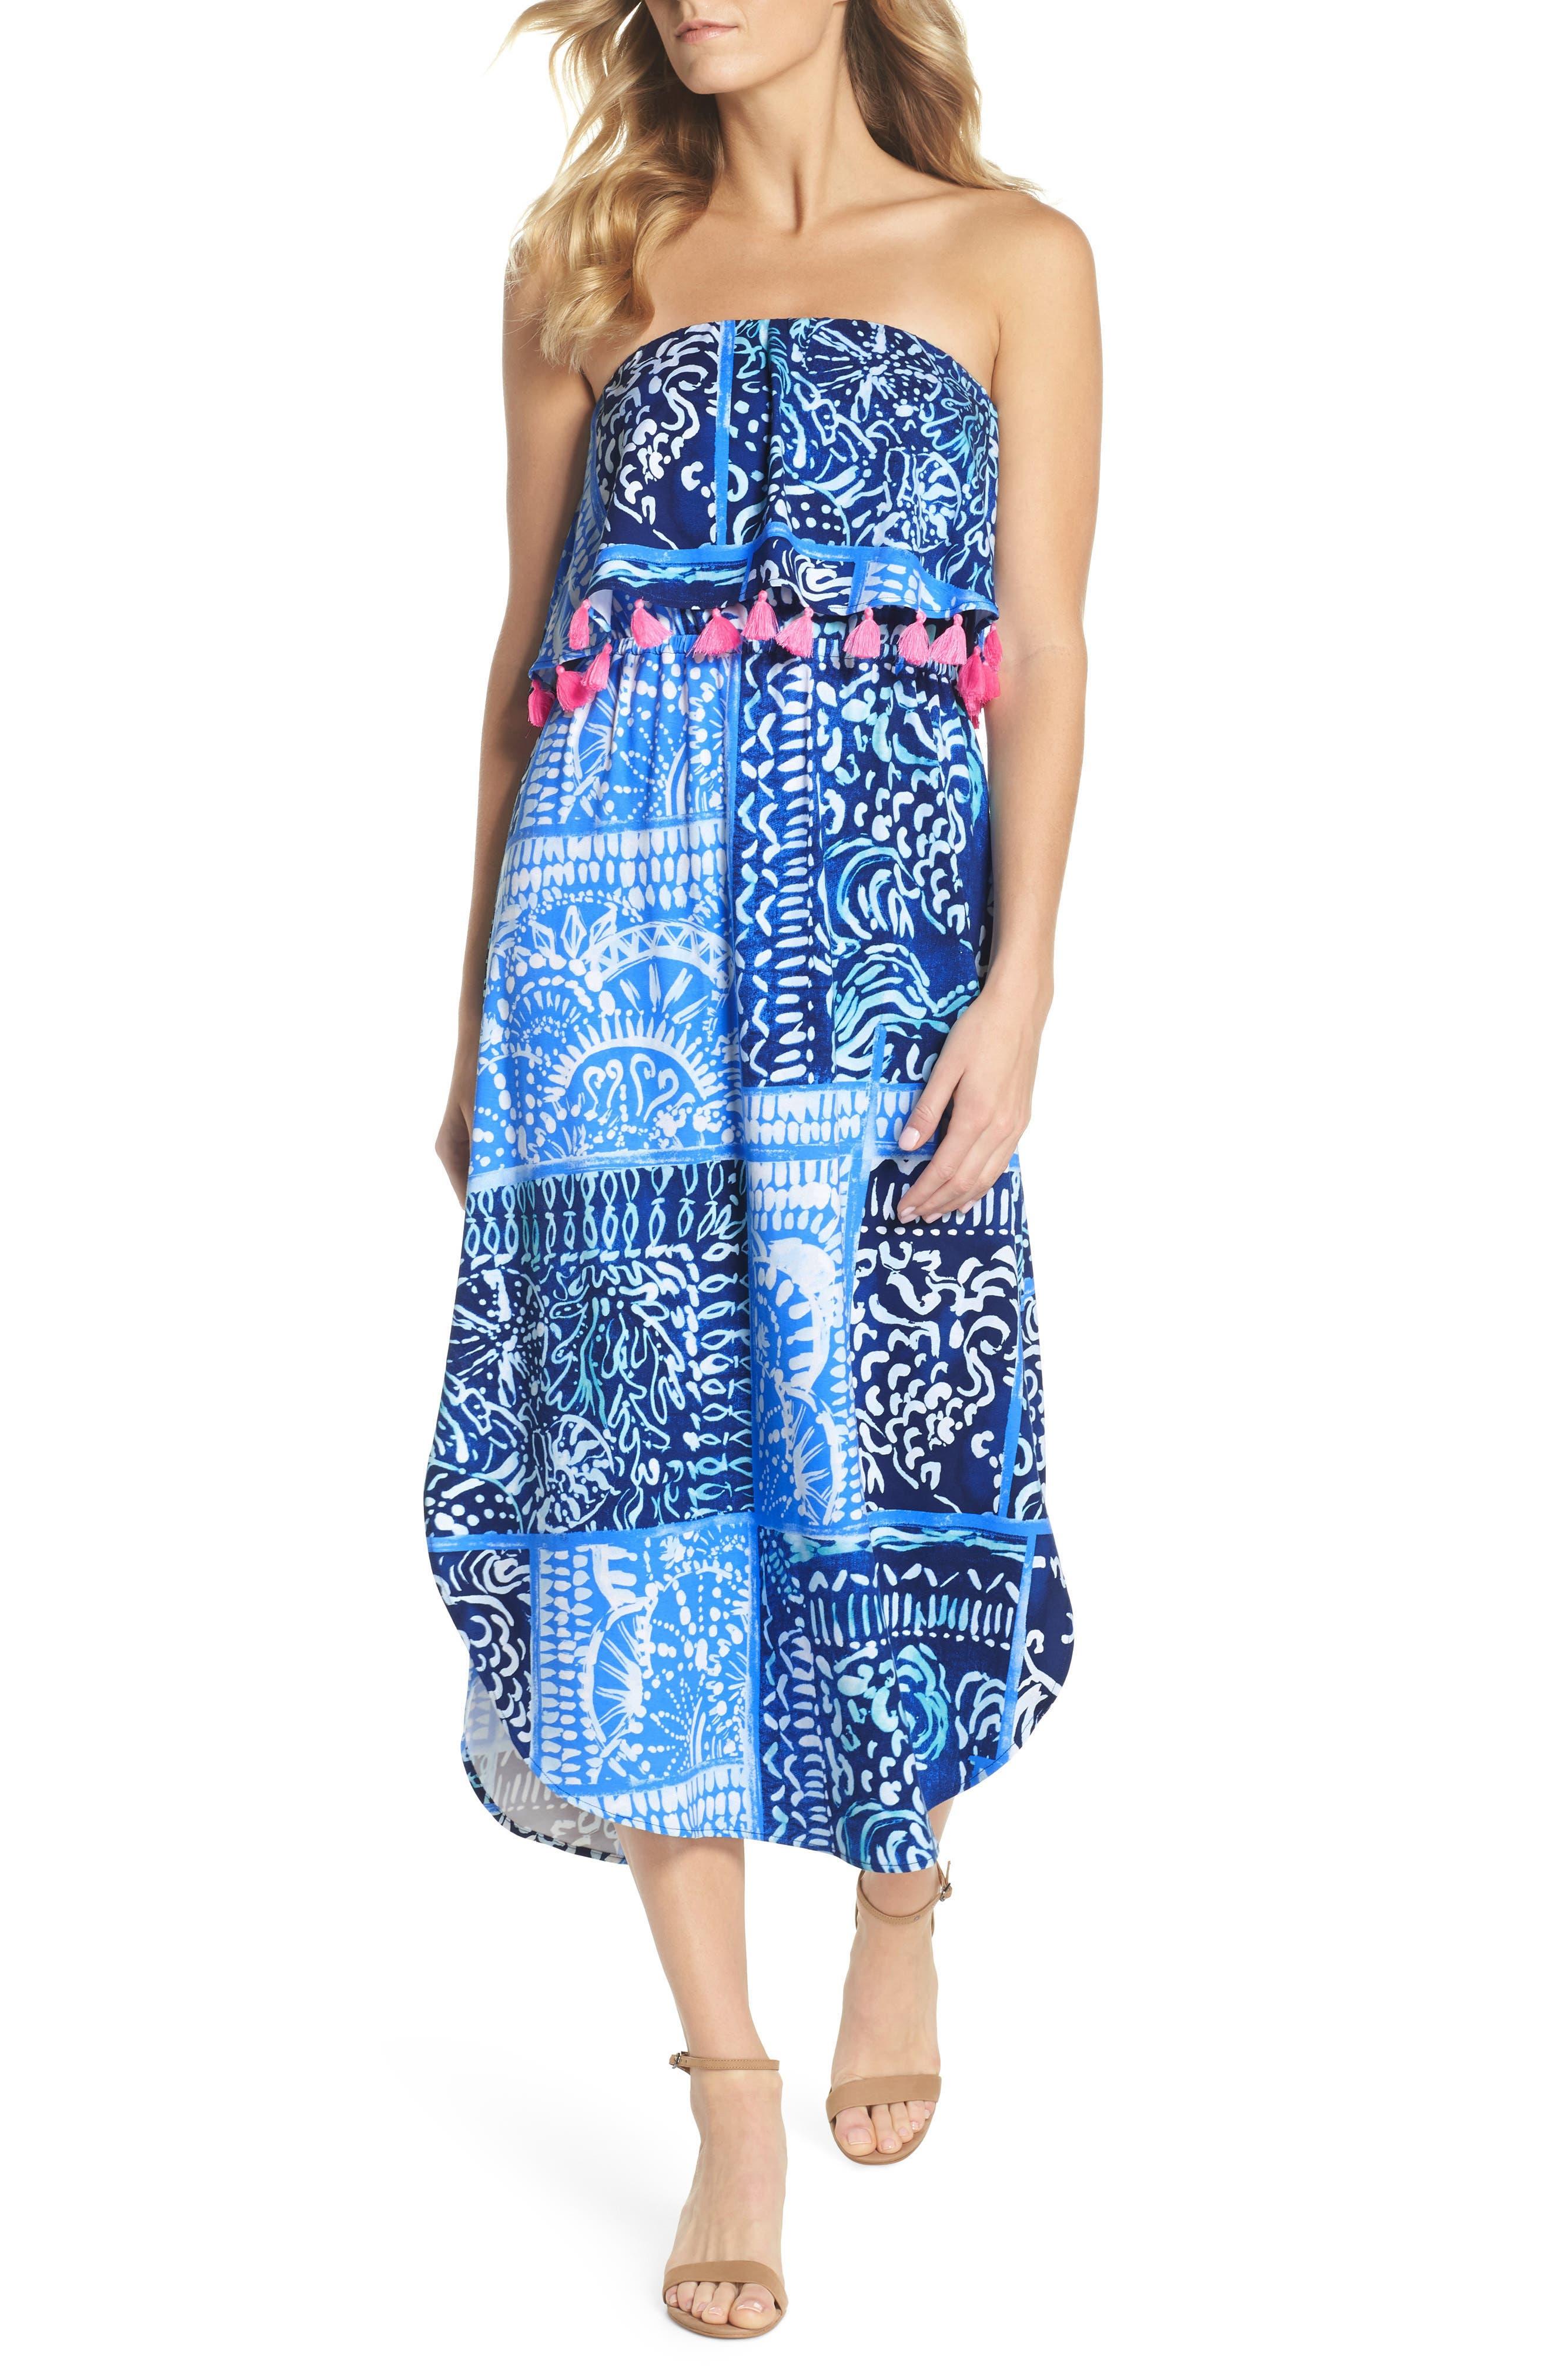 Lilly Pulitzer Meridian Strapless Midi Dress